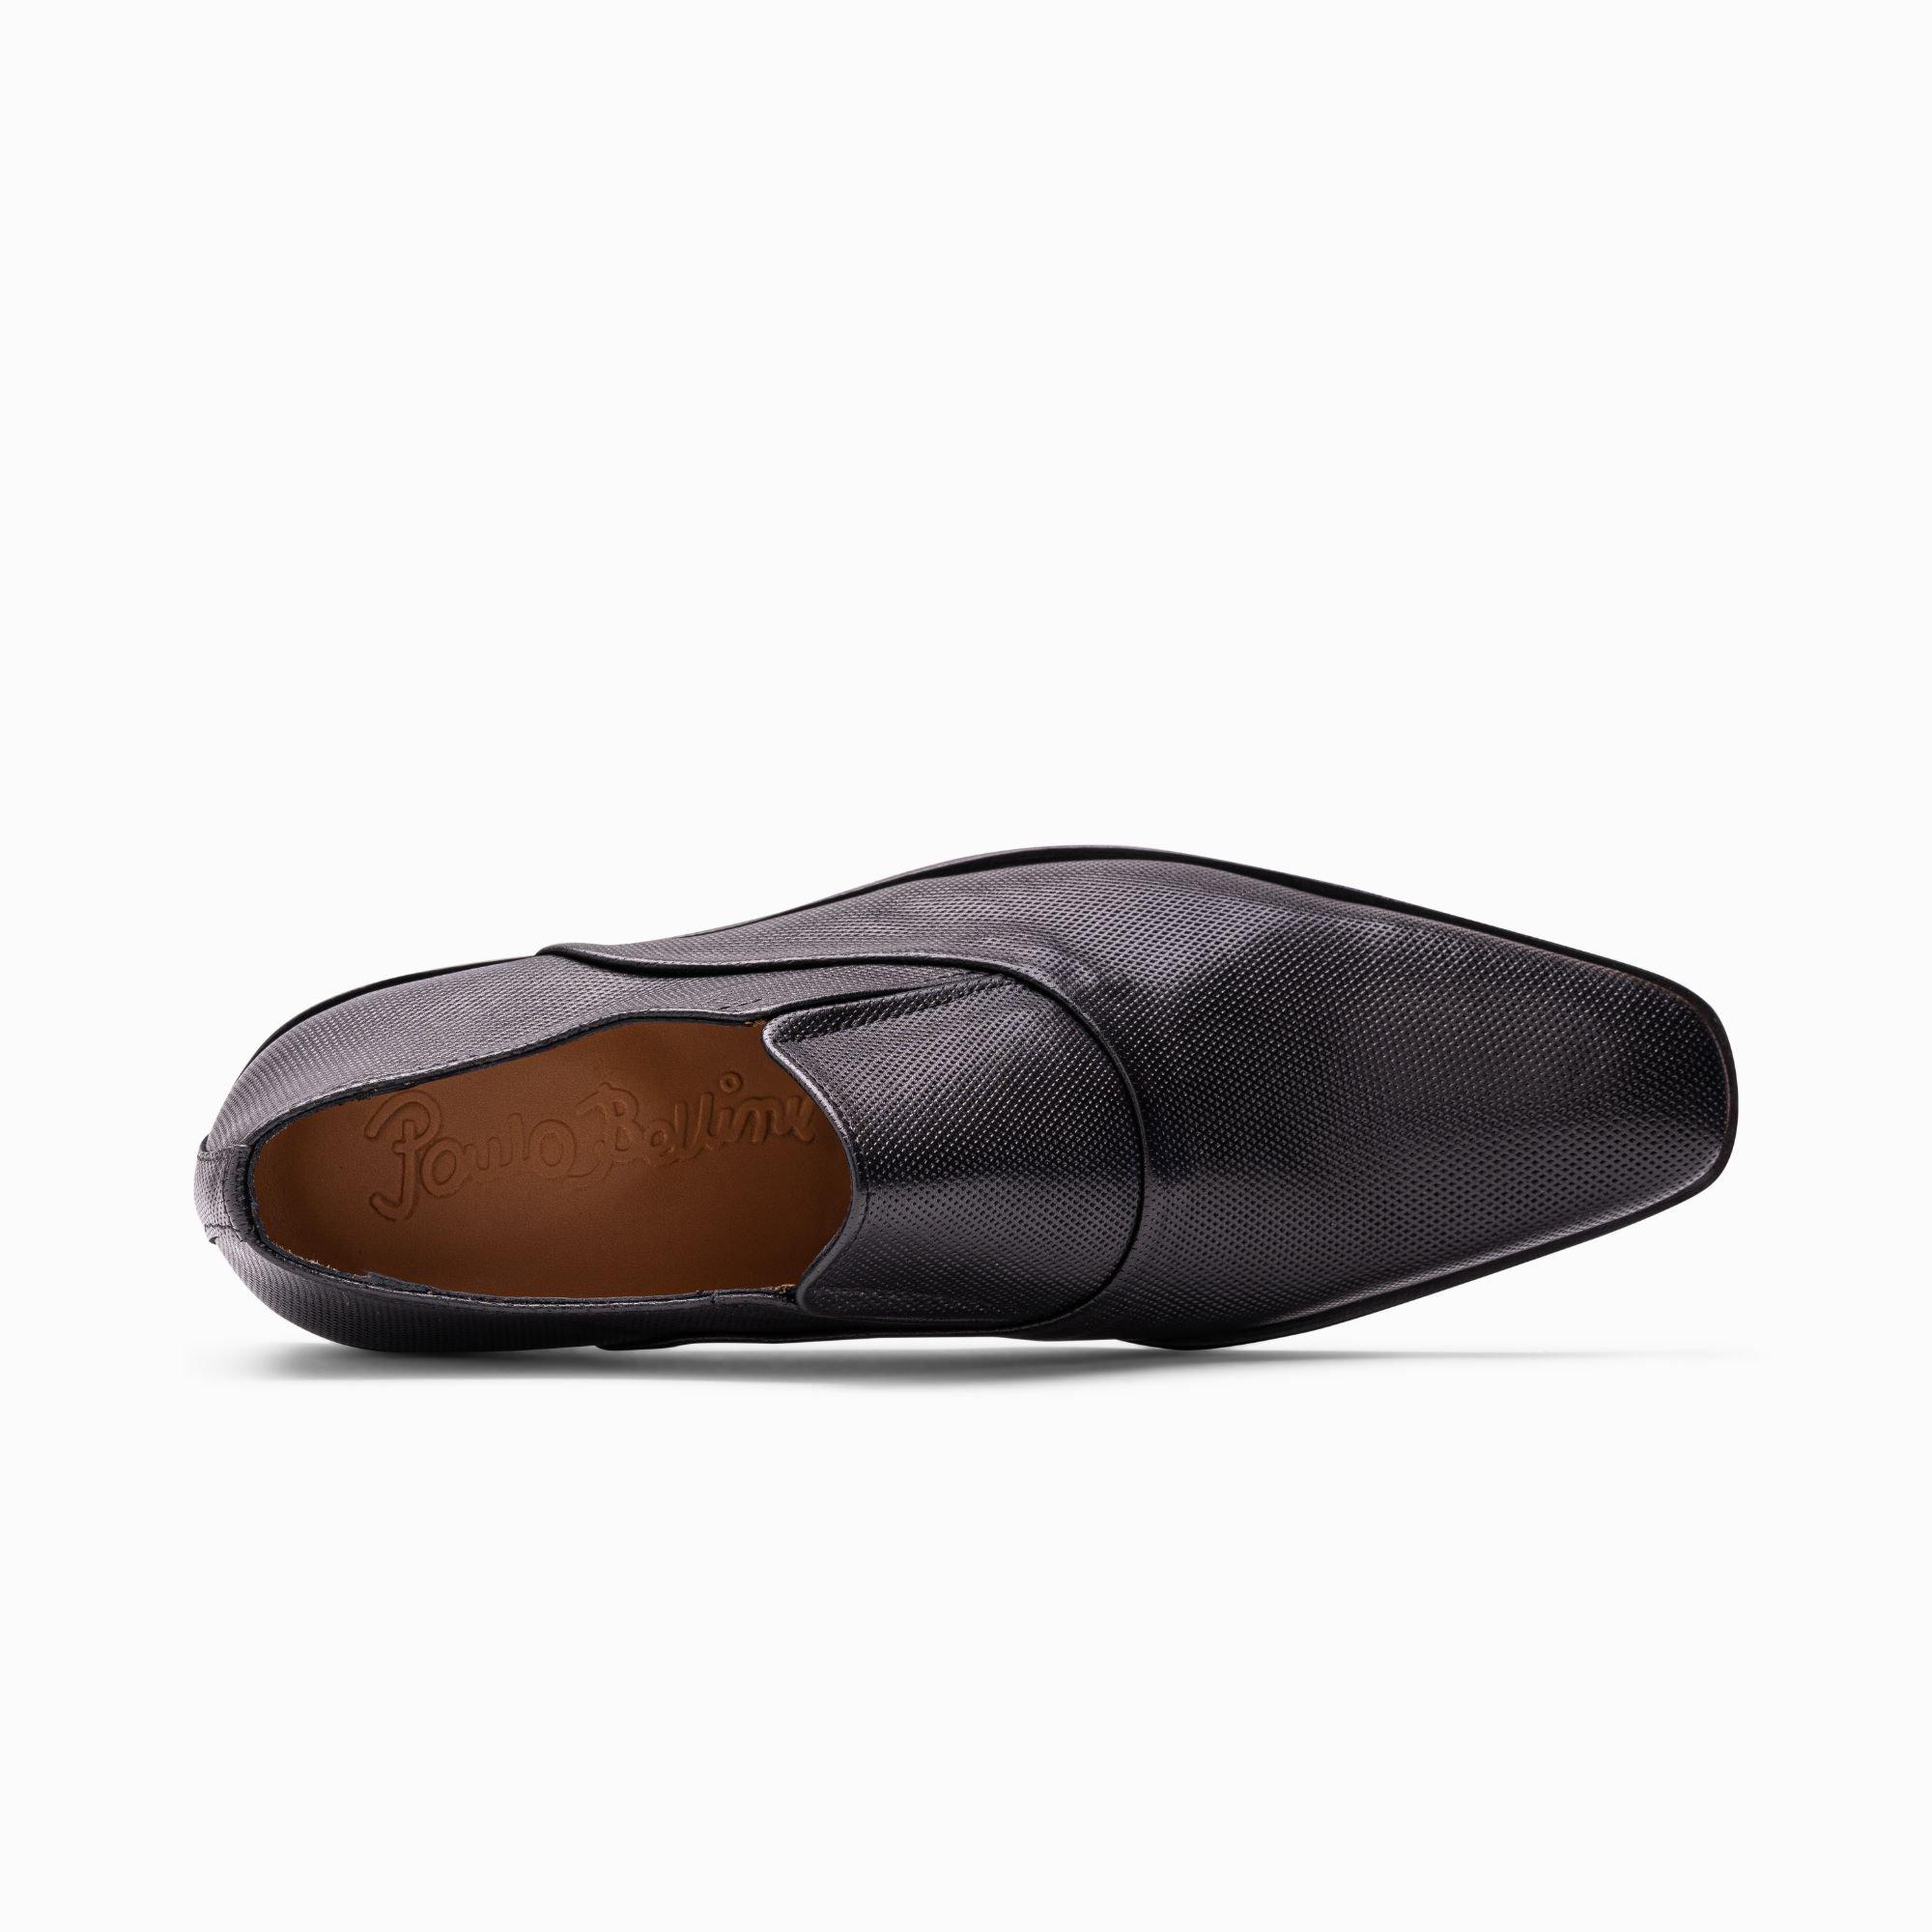 1301b-black-mat-leather_03